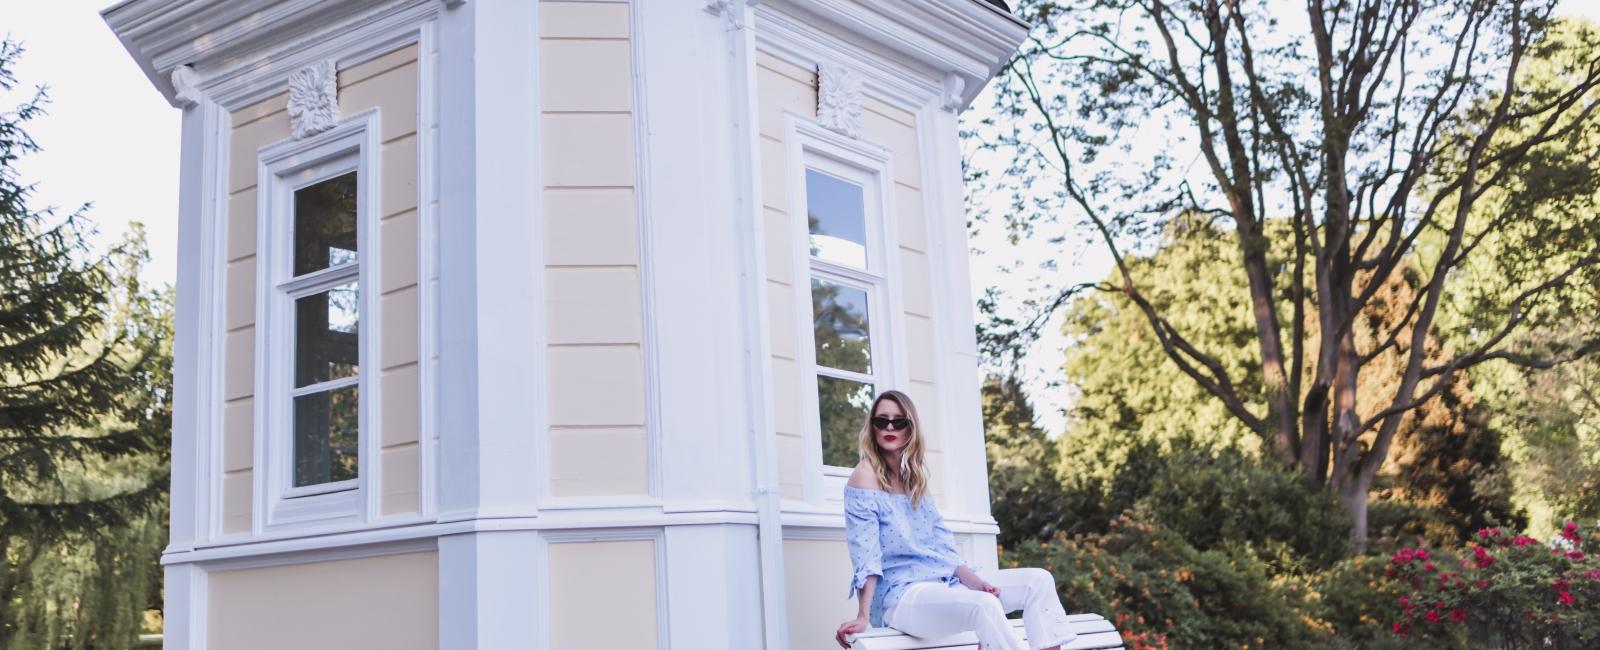 MOD-by-Monique-Fashion-Looks-Gr8ful-Fashion-May-2018-17